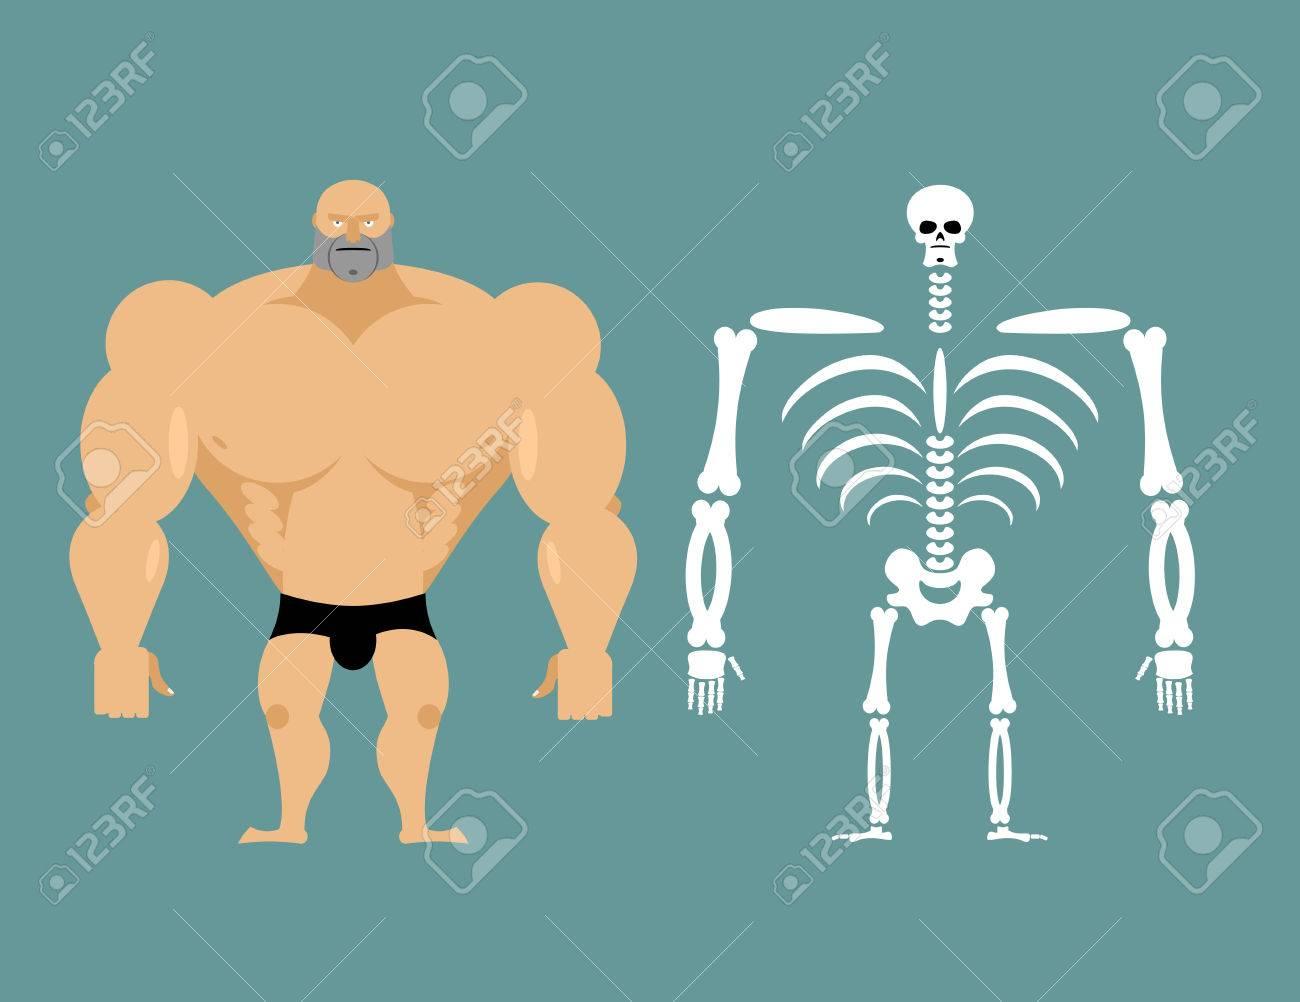 Human Structure Skeleton Men Construction Of Athlete Bones